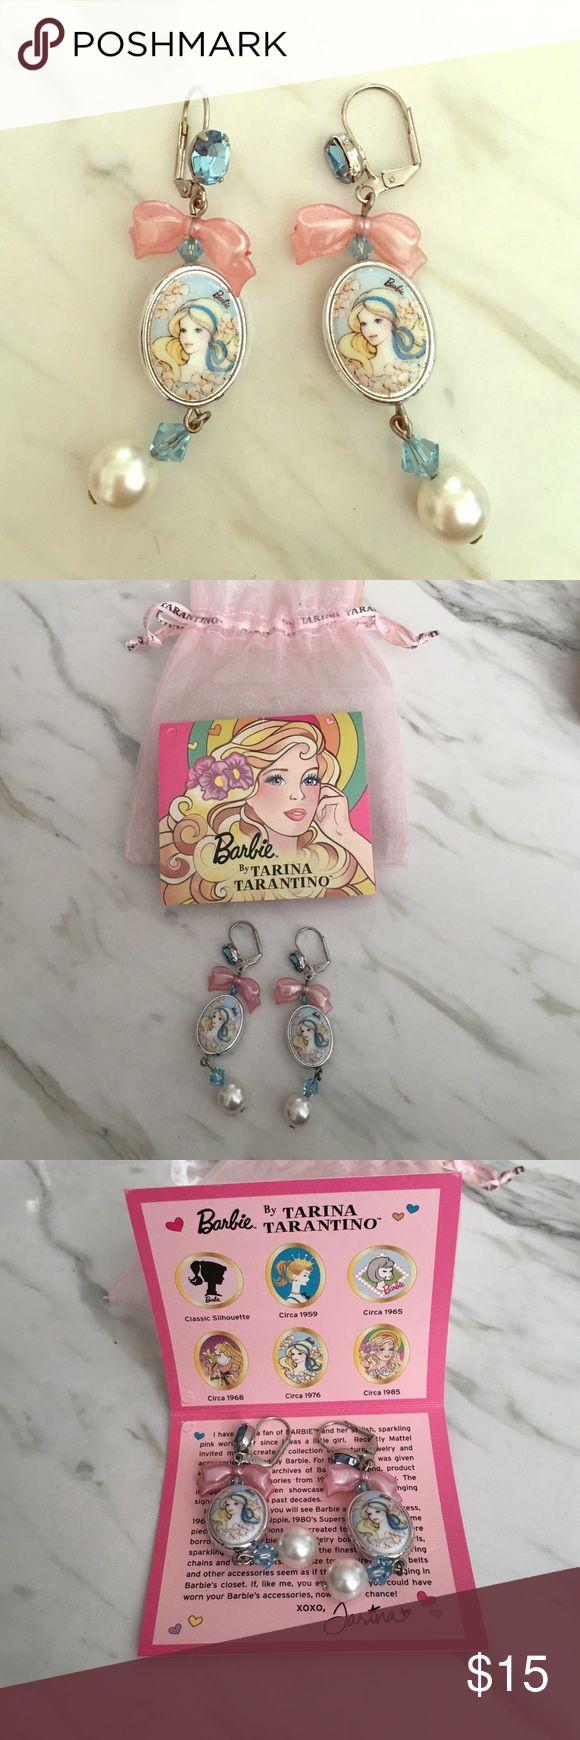 Barbie earrings by Tarina Tarantino Adorable Barbie earrings I never wear anymore! I still have the bag and card it comes with. Tarina Tarantino Jewelry Earrings